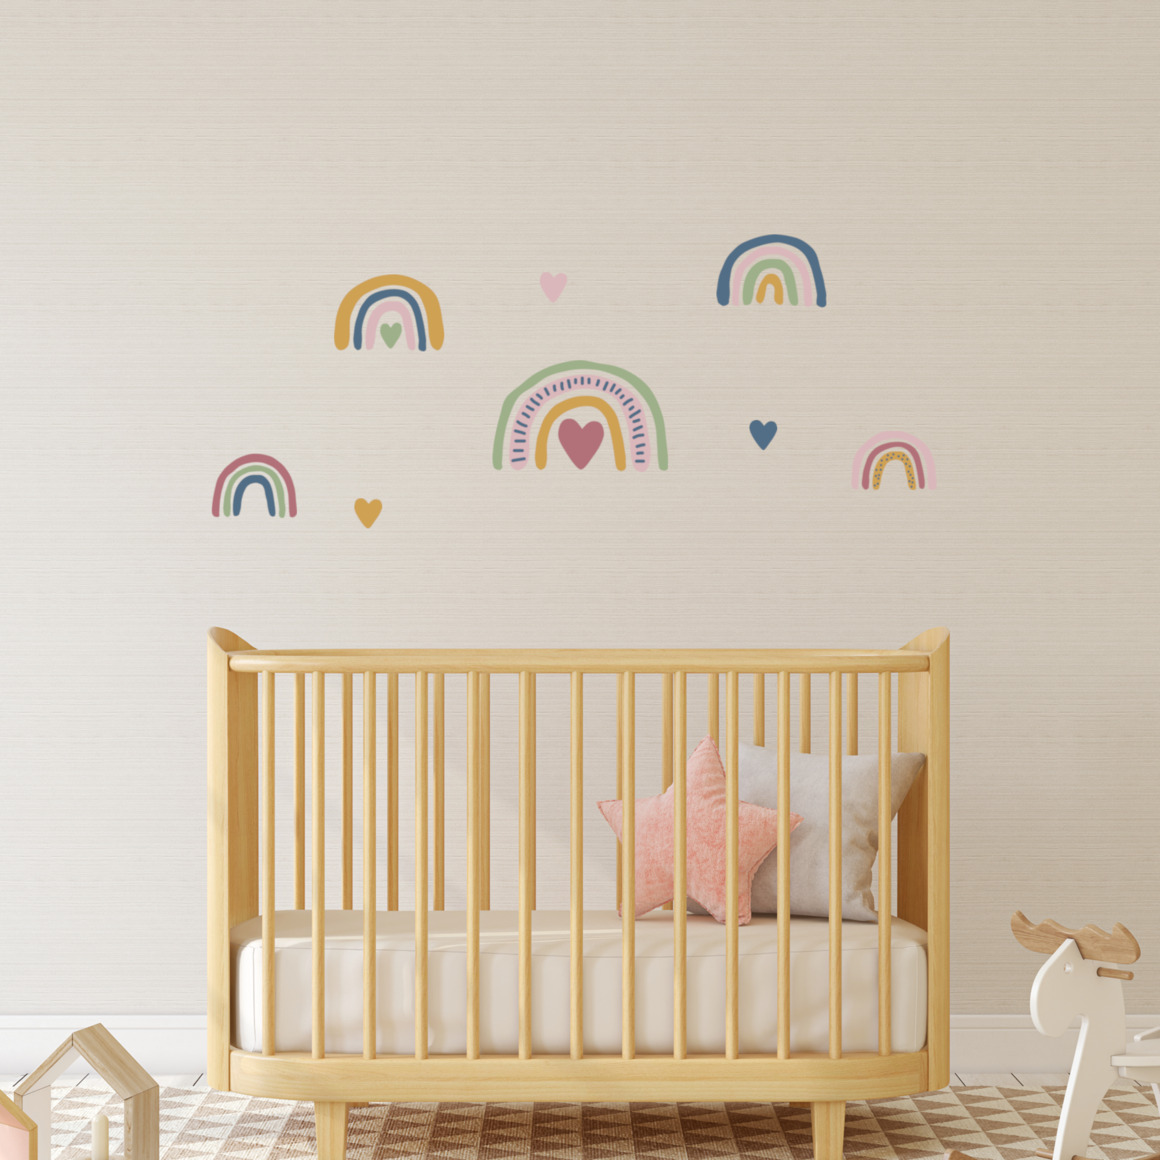 Fabric wall decals - Rainbows1   Trada Marketplace